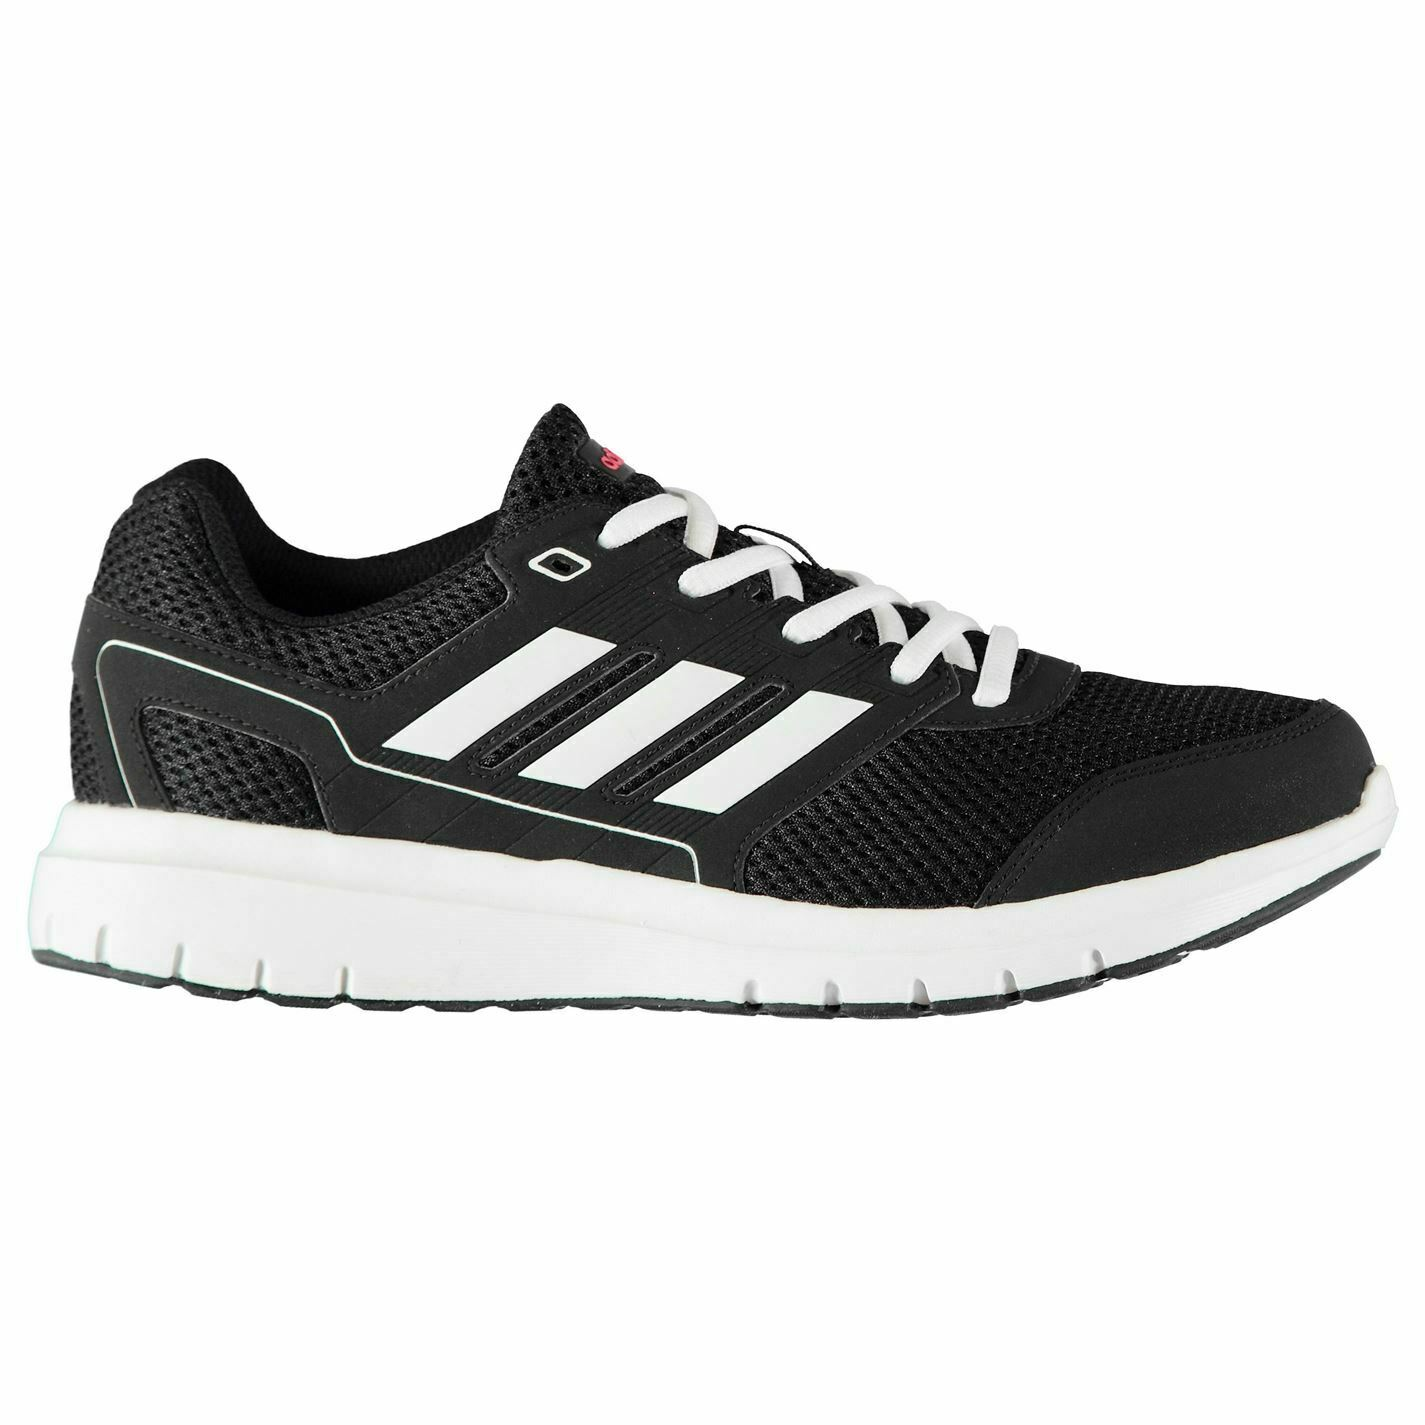 SCHUHE adidas Duramo Lite 2.0 schwarz Bianco 5½